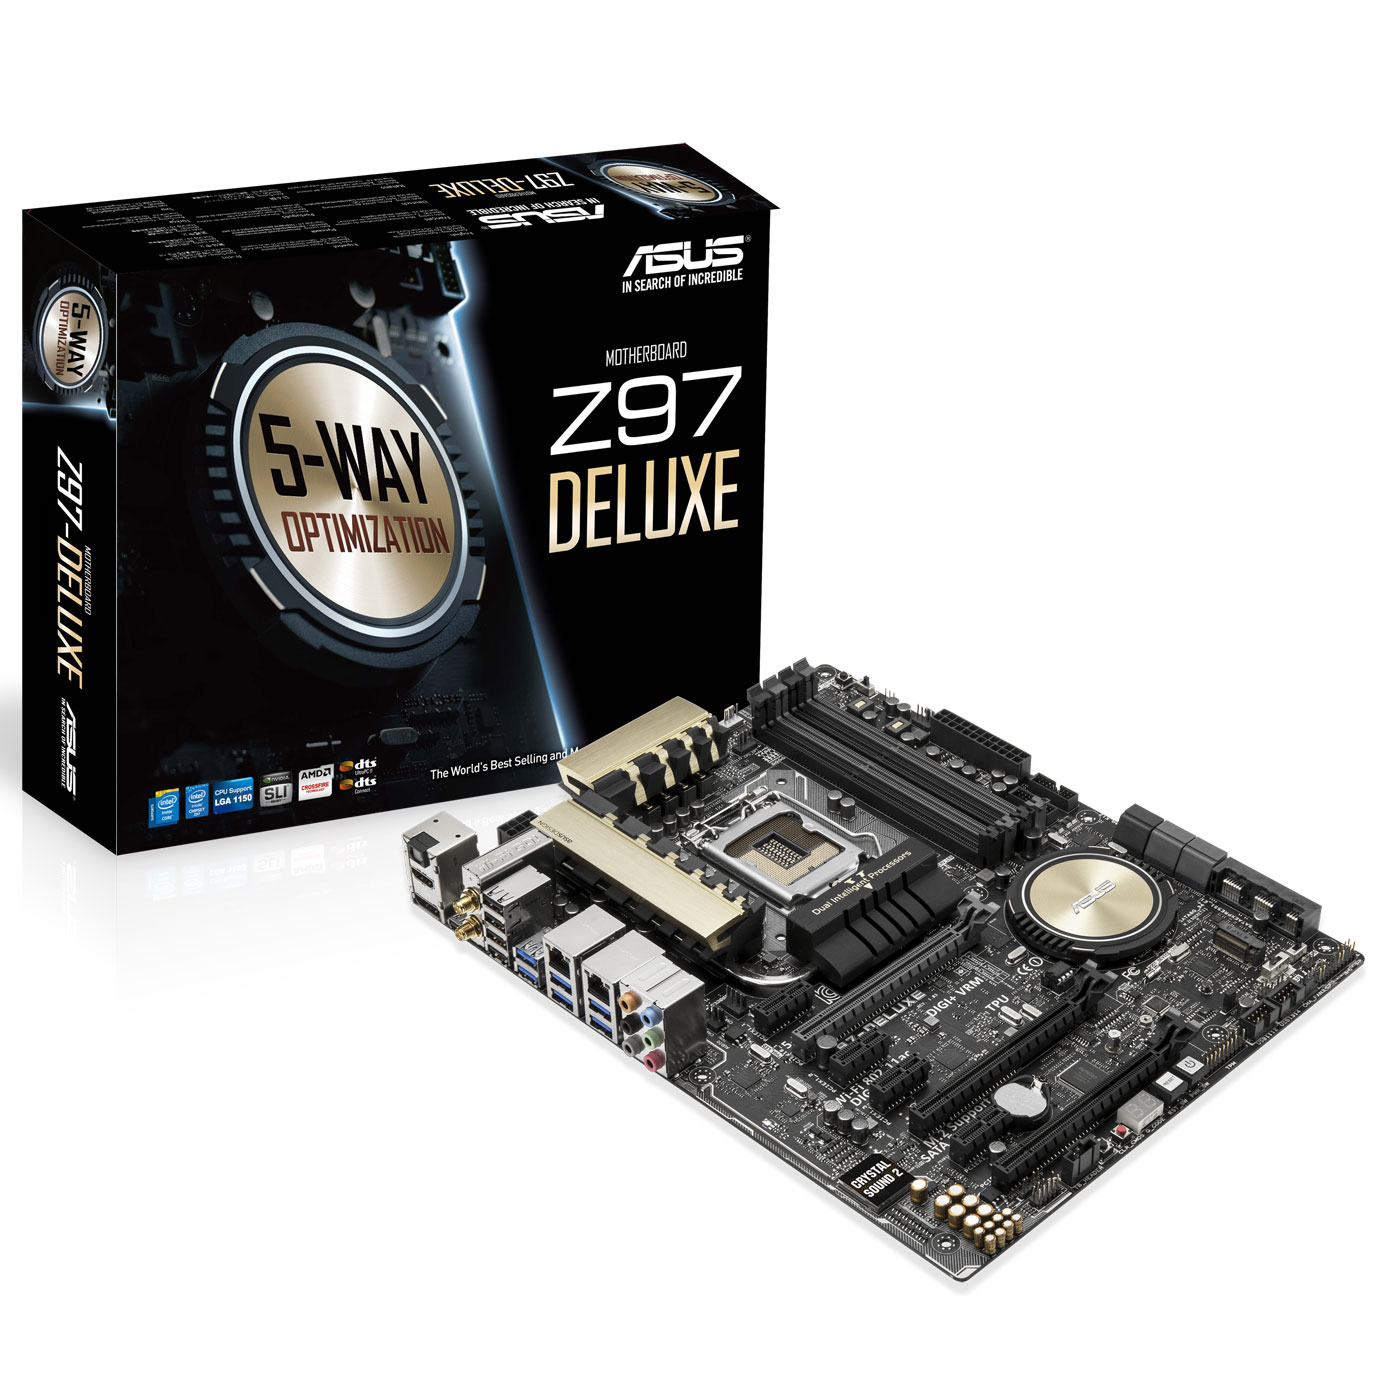 Carte mère ASUS Z97-DELUXE Carte mère ATX Socket 1150 Intel Z97 Express - SATA 6Gb/s - USB 3.0 - 2x PCI-Express 3.0 16x + 1x PCI-Express 2.0 16x